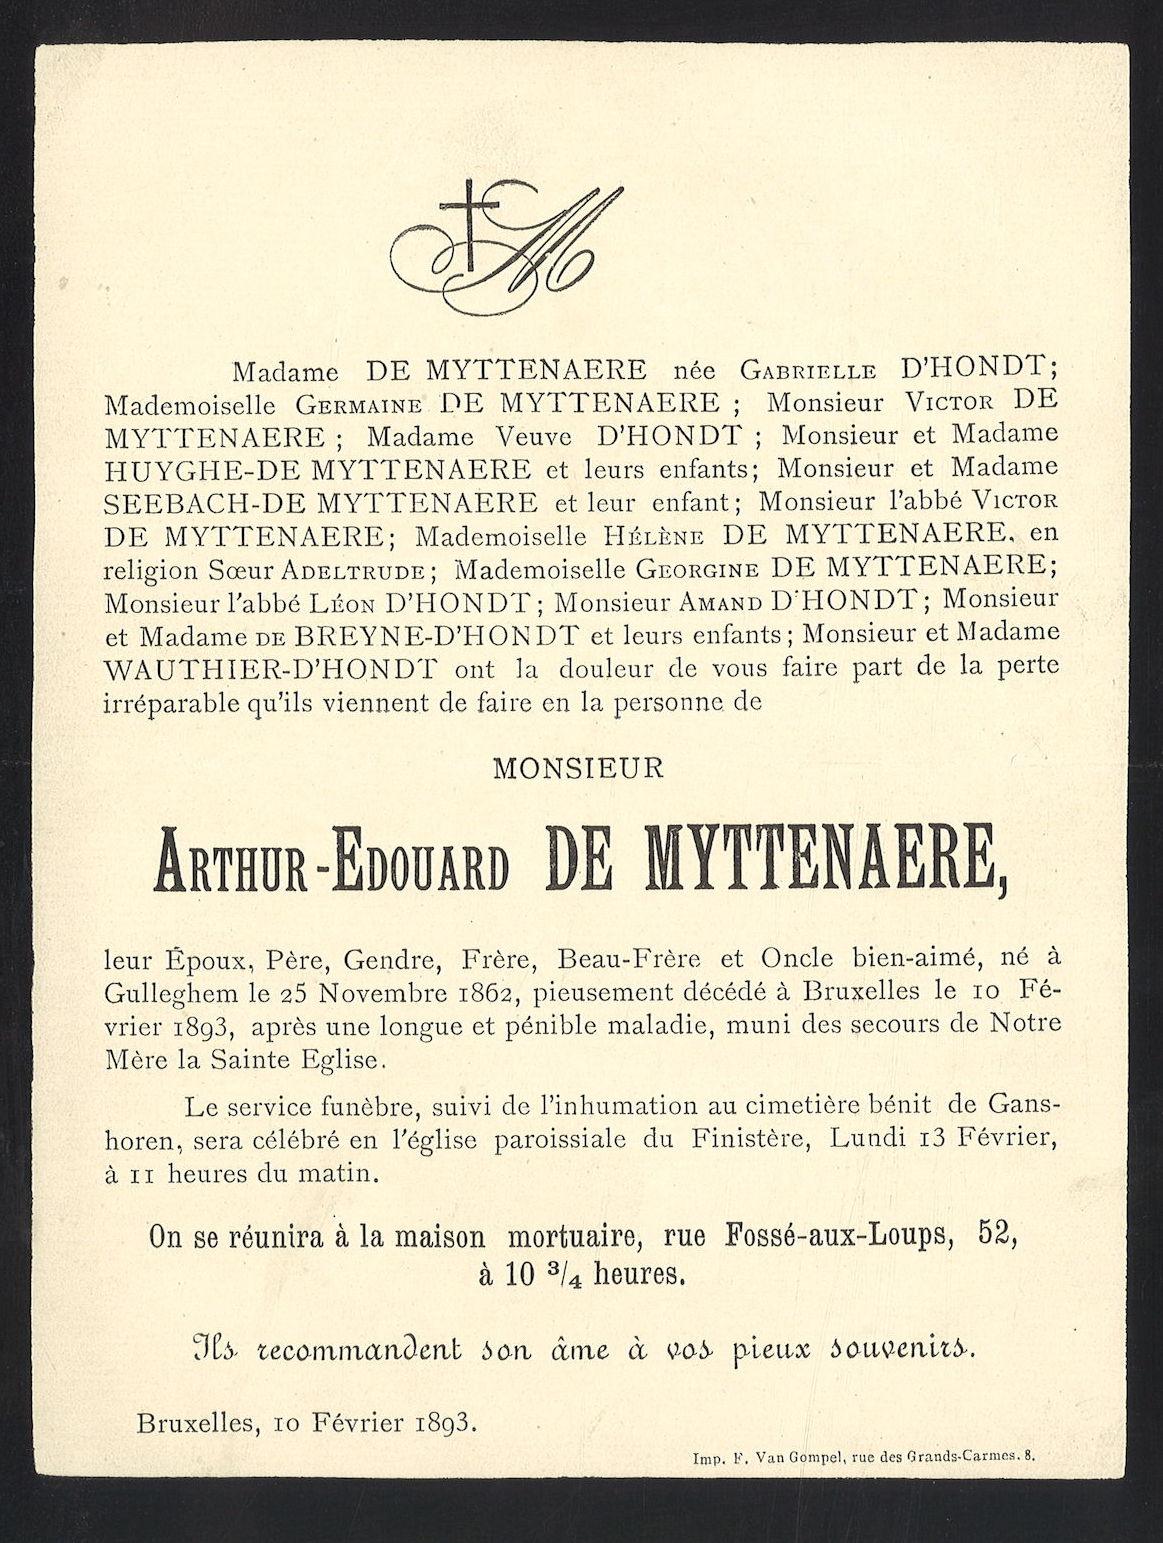 Arthur-Edouard De Myttenaere